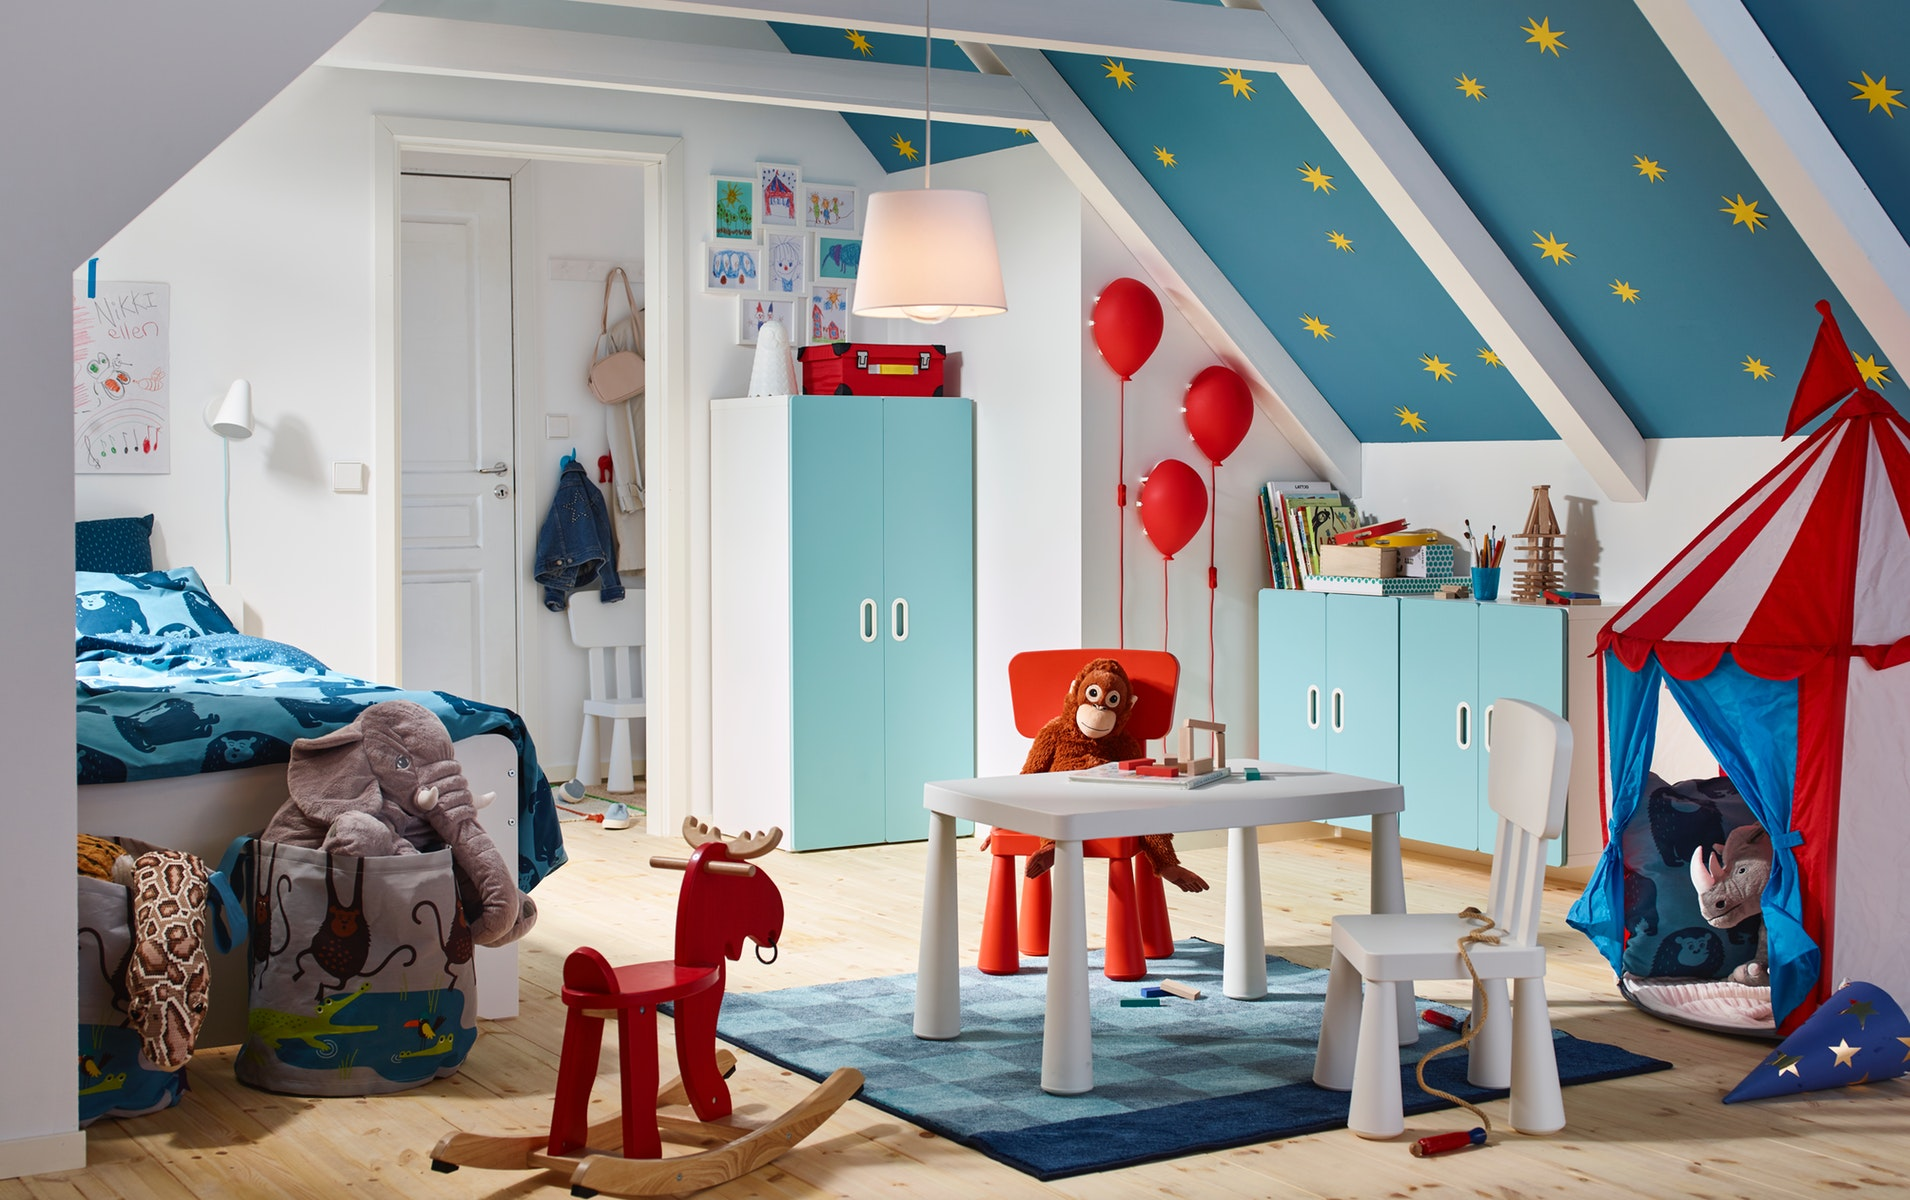 Ide dekorasi kamar tidur anak